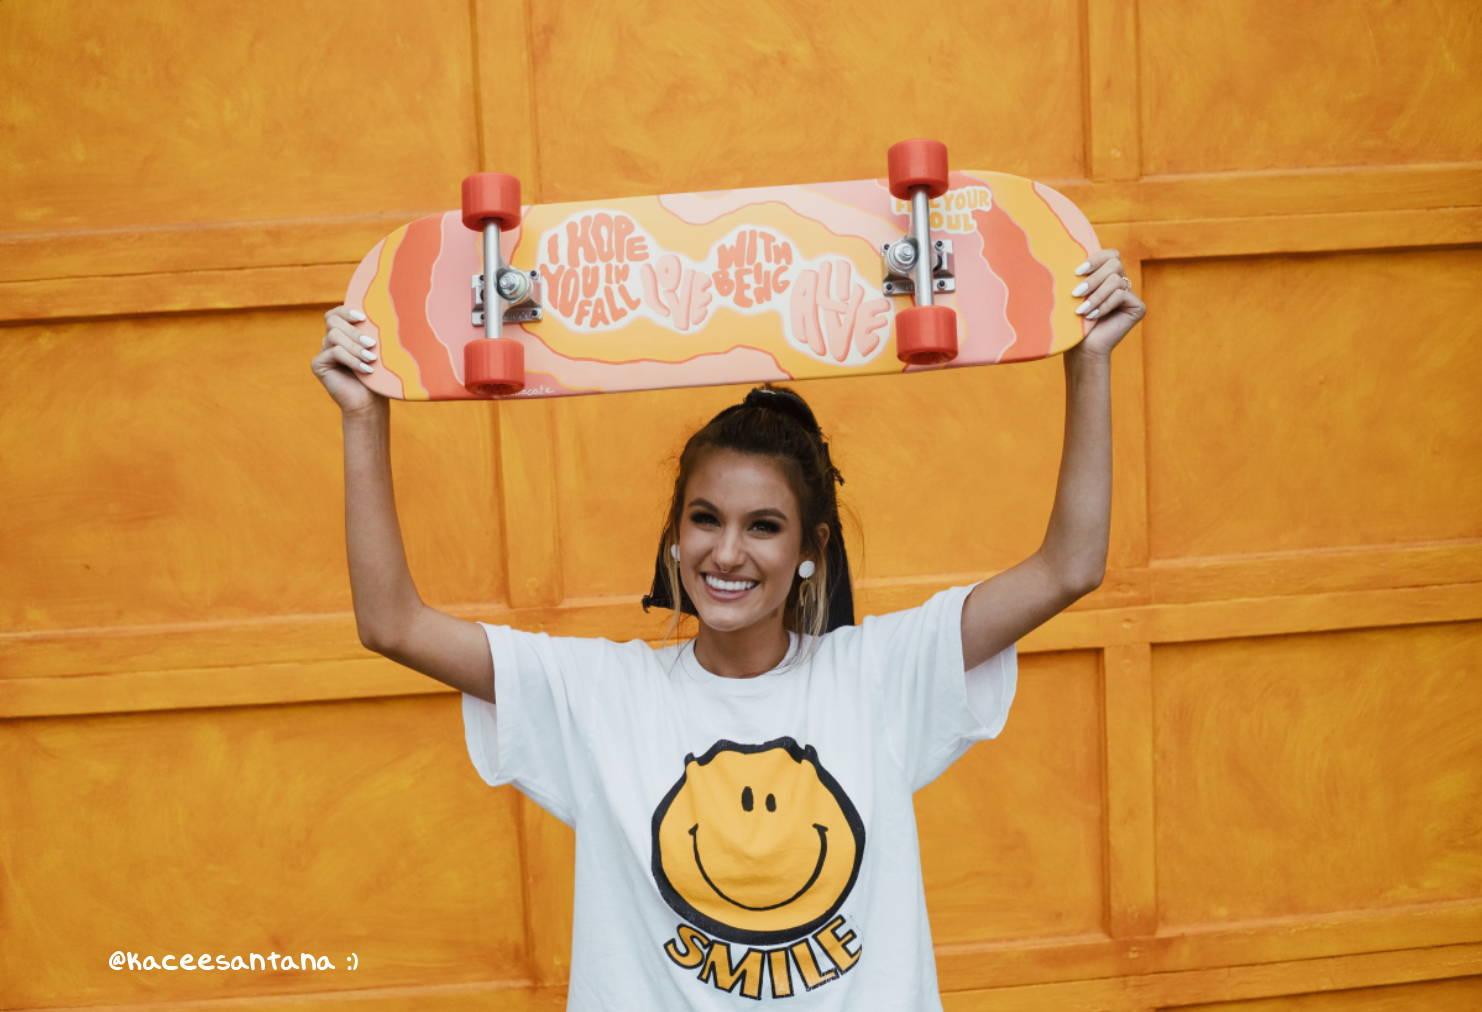 skateboard feel your soul